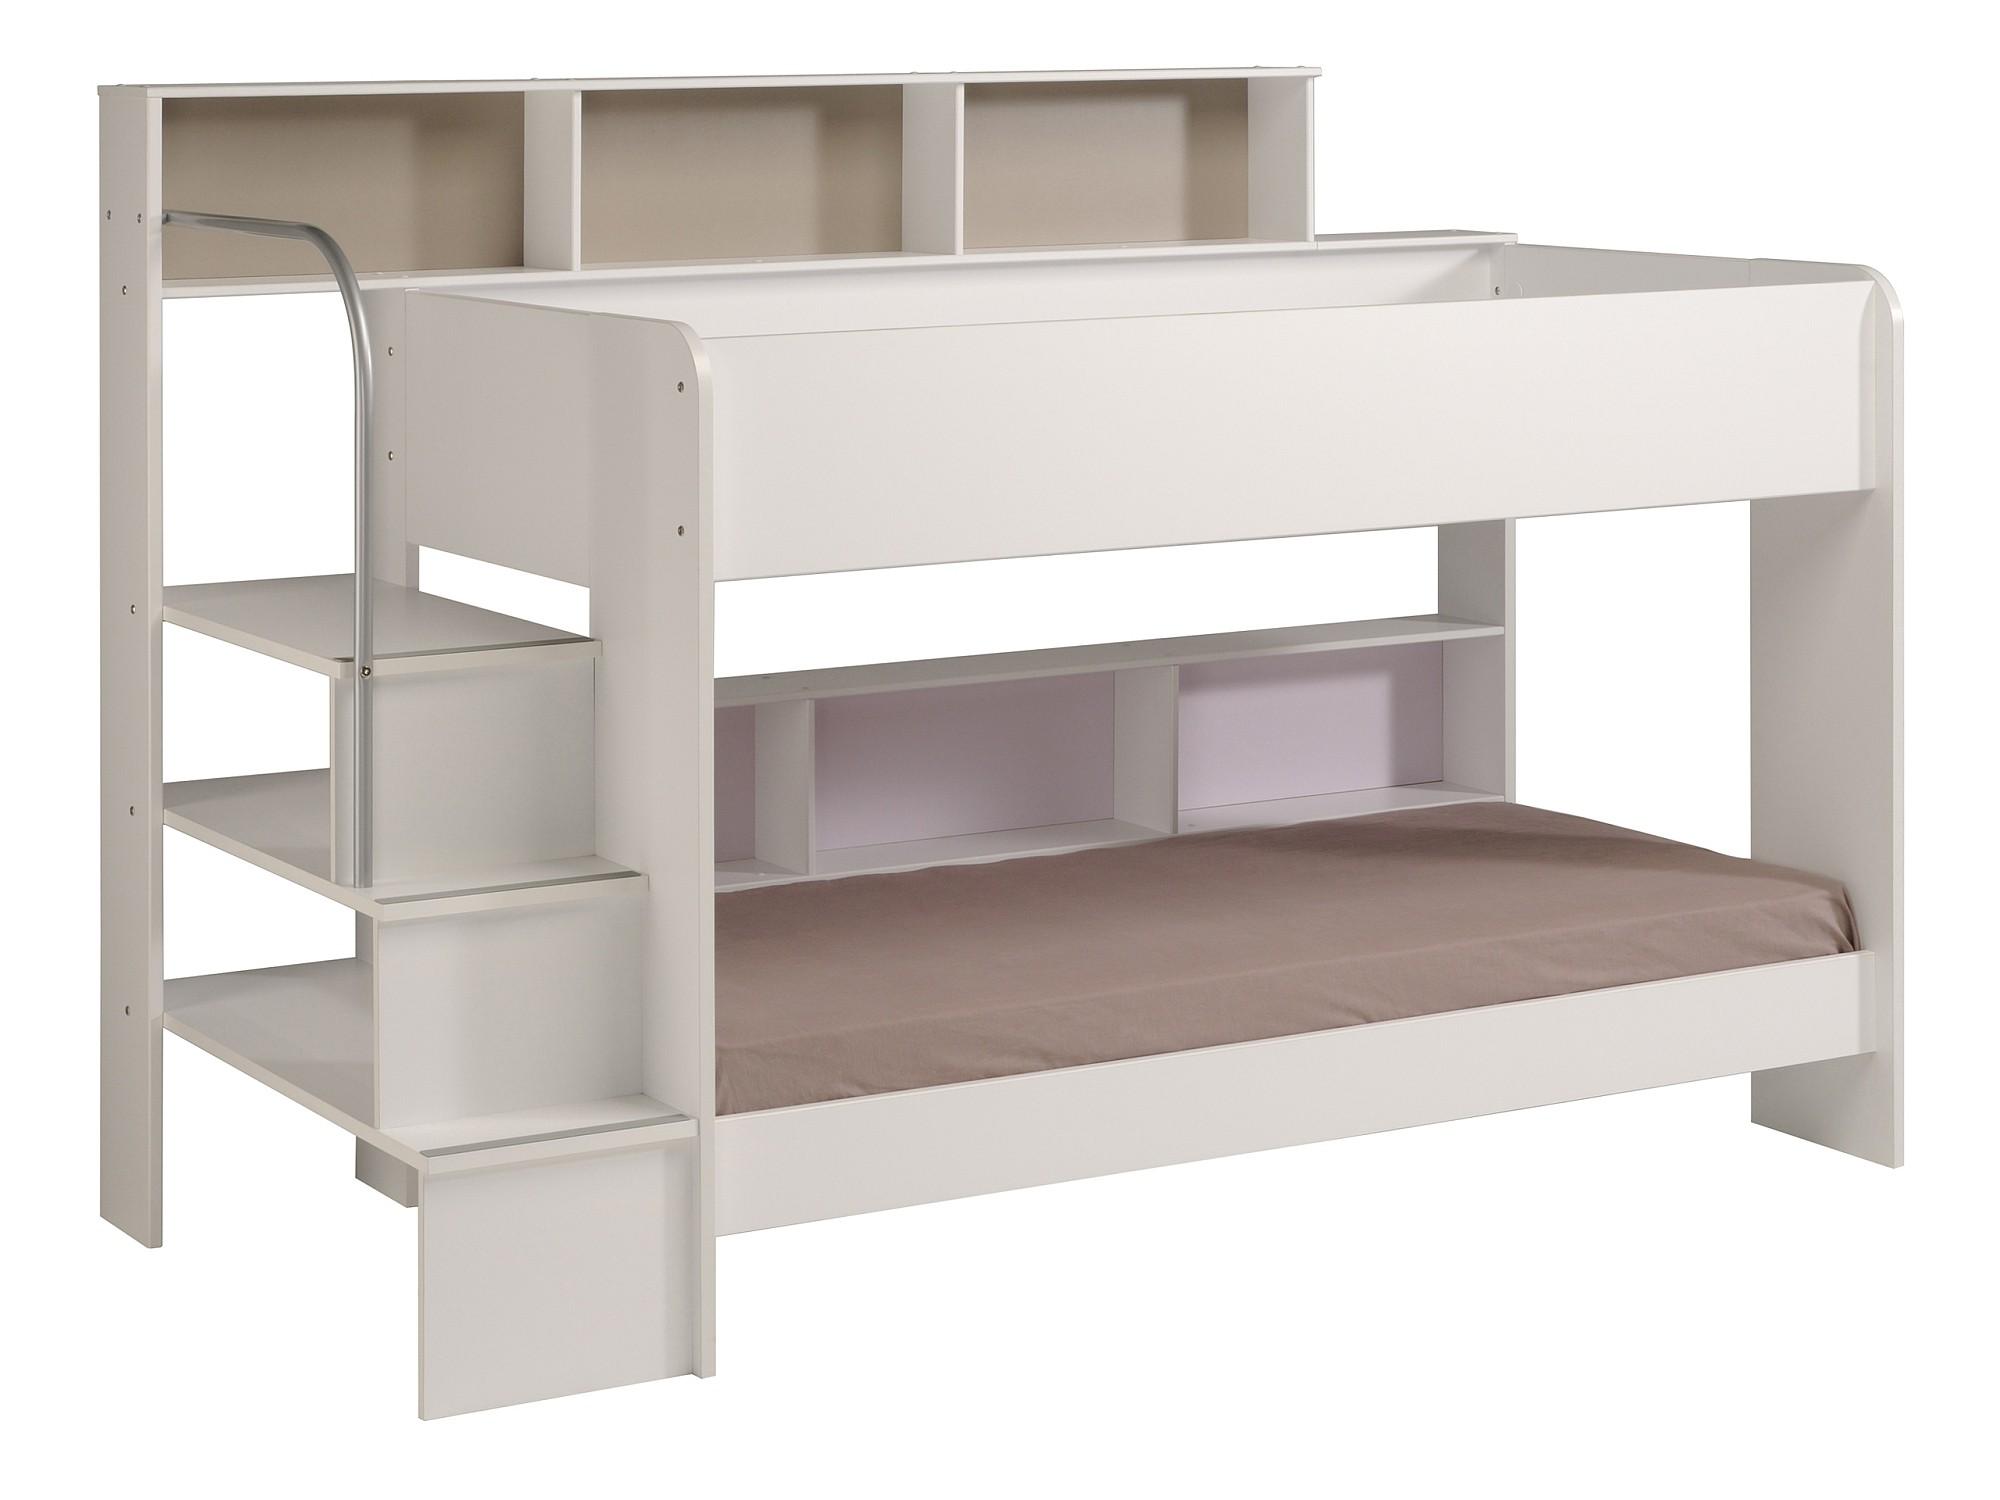 Etagenbett Zu Verschenken : Vipack robin etagenbett weiß cm rosb jetzt bestellen